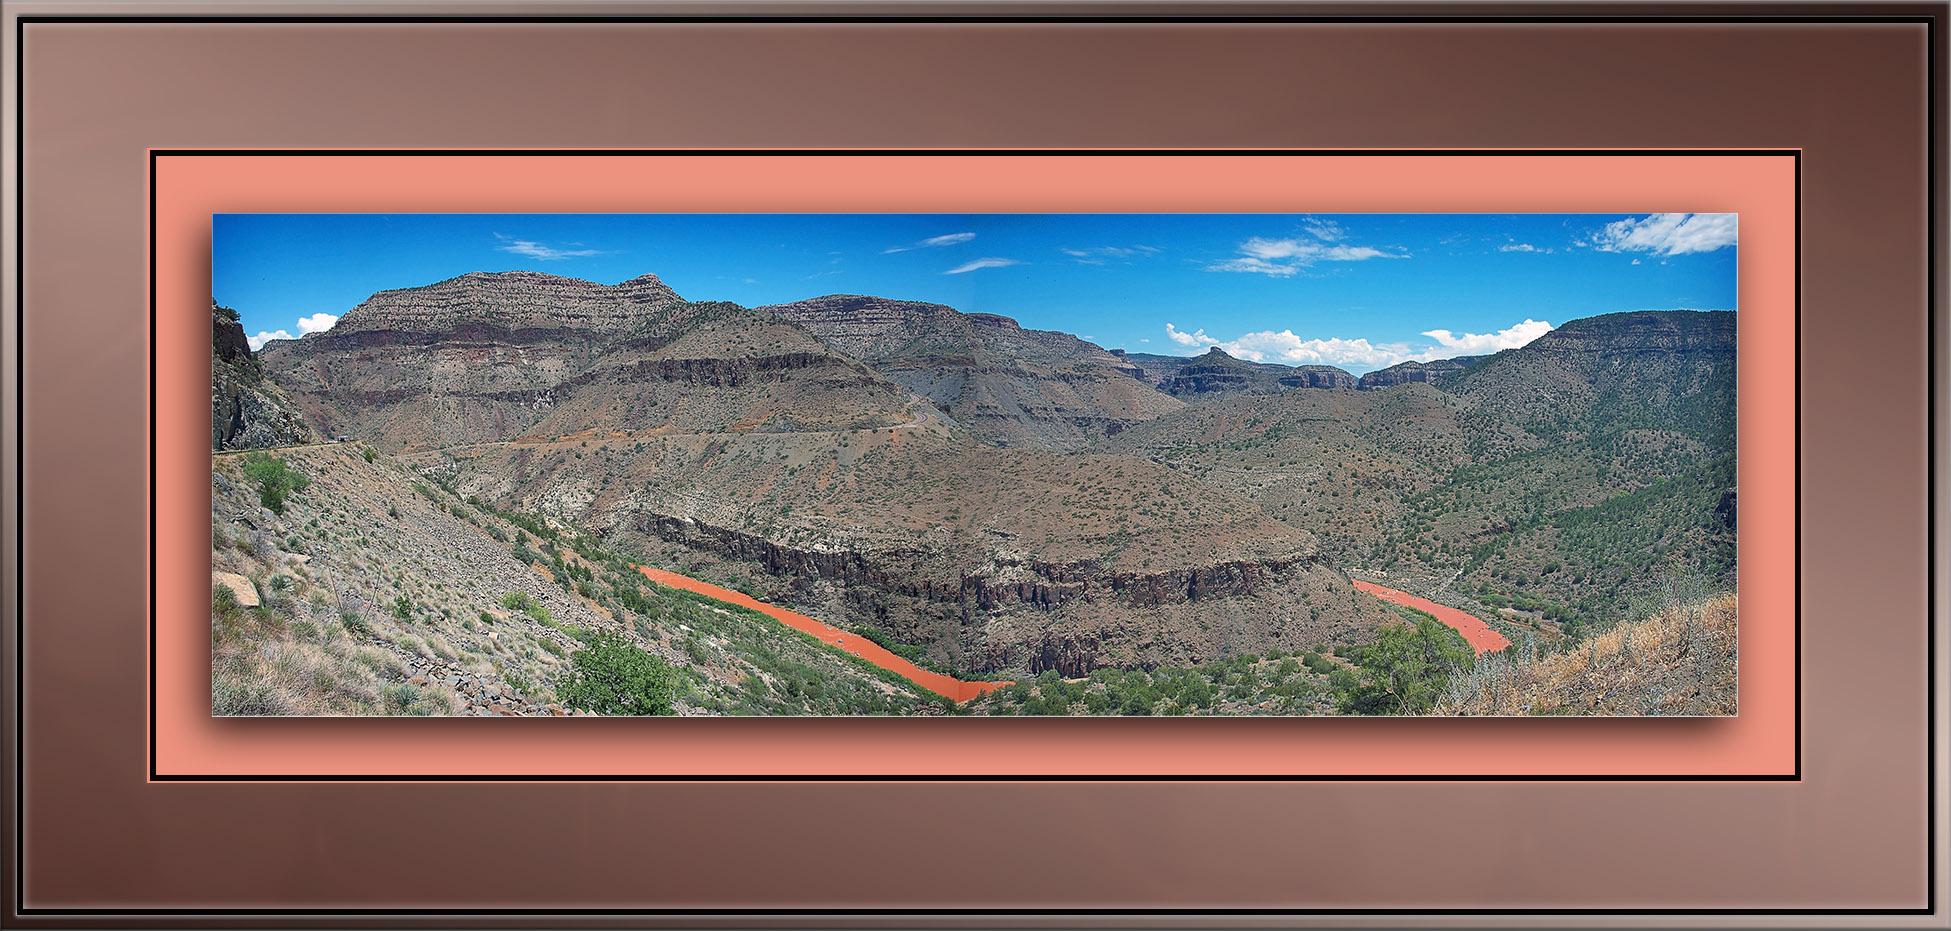 Salt River Canyon Panoranma blog framed